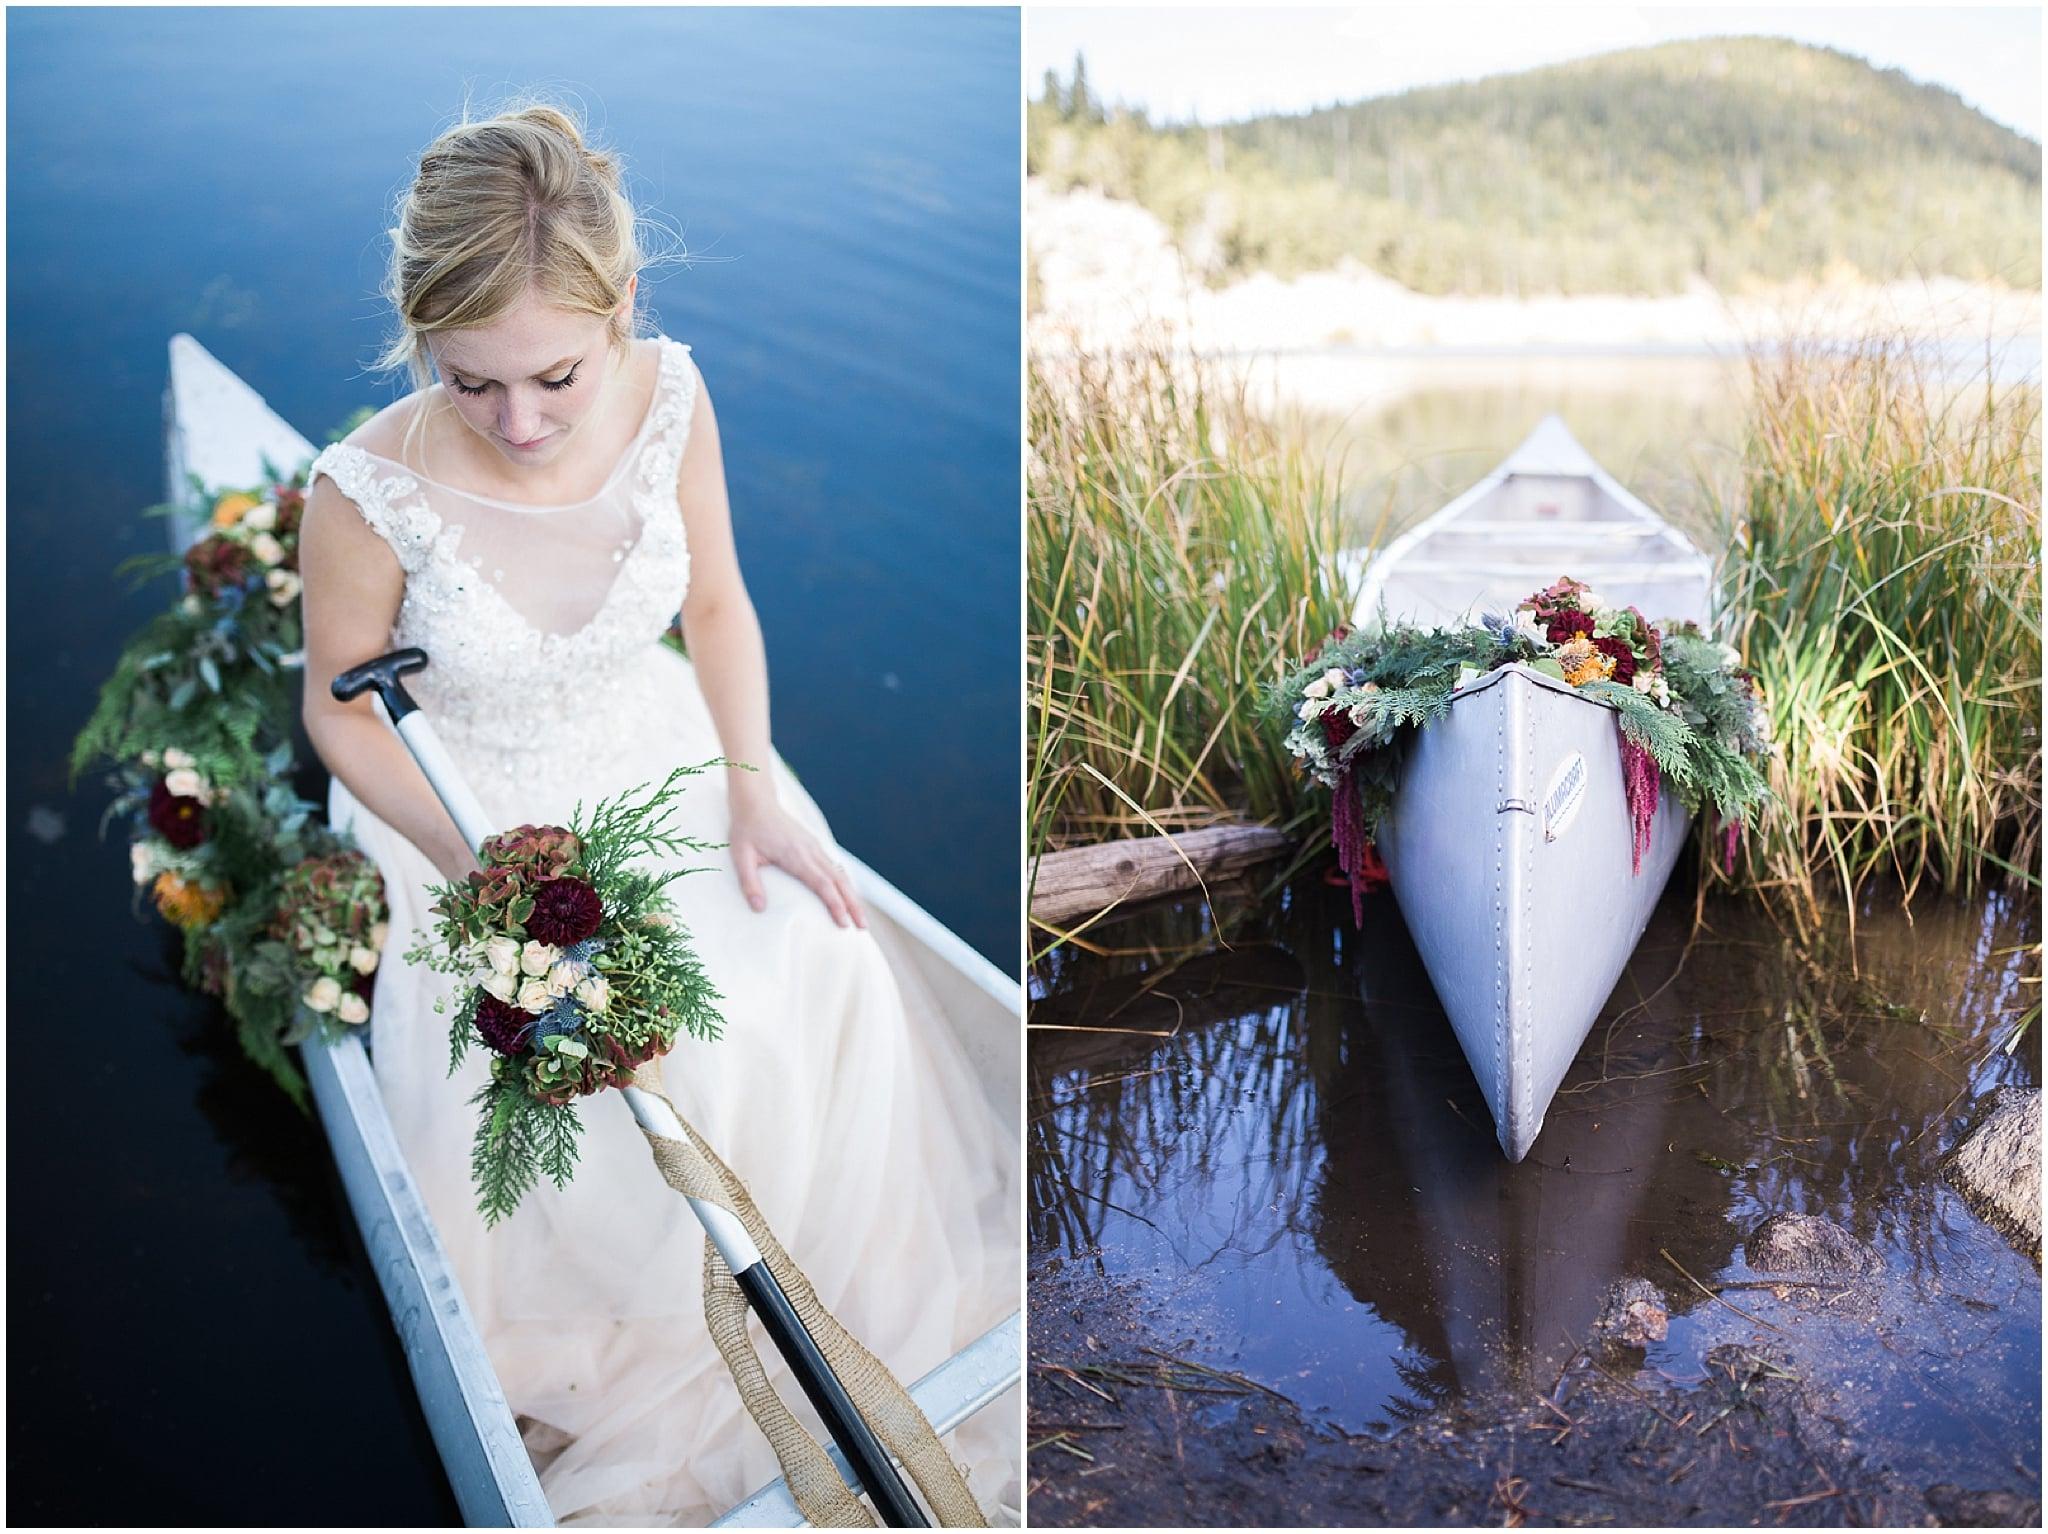 Colorado Mountain Wedding Photographer - canoe with flower garland